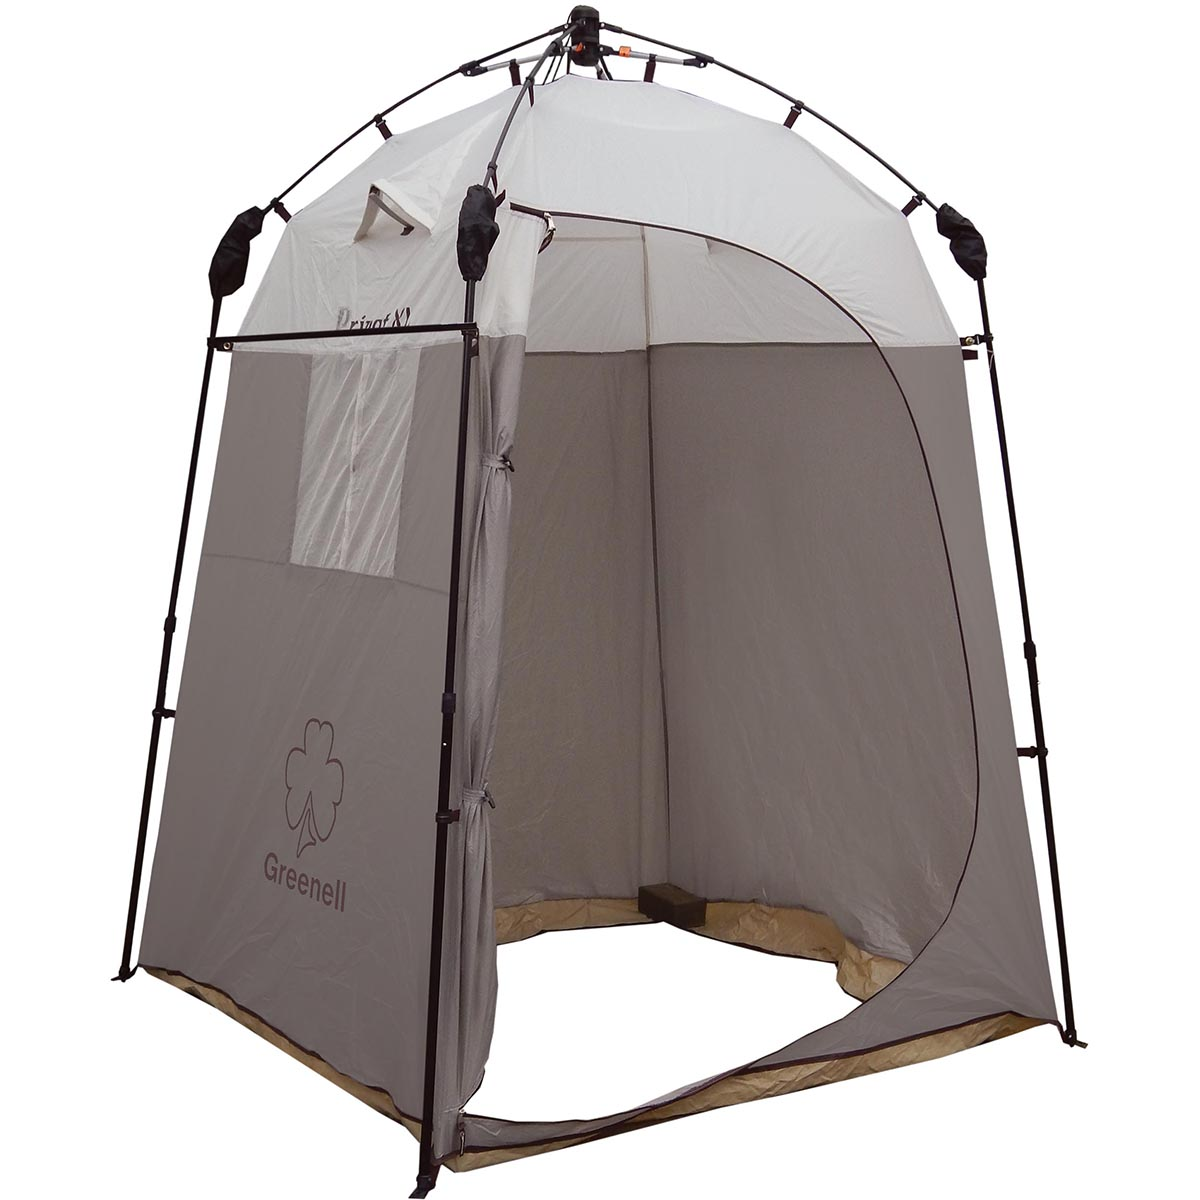 Тент-шатер Greenell Приват XL, с автоматическим каркасом, цвет: коричневый